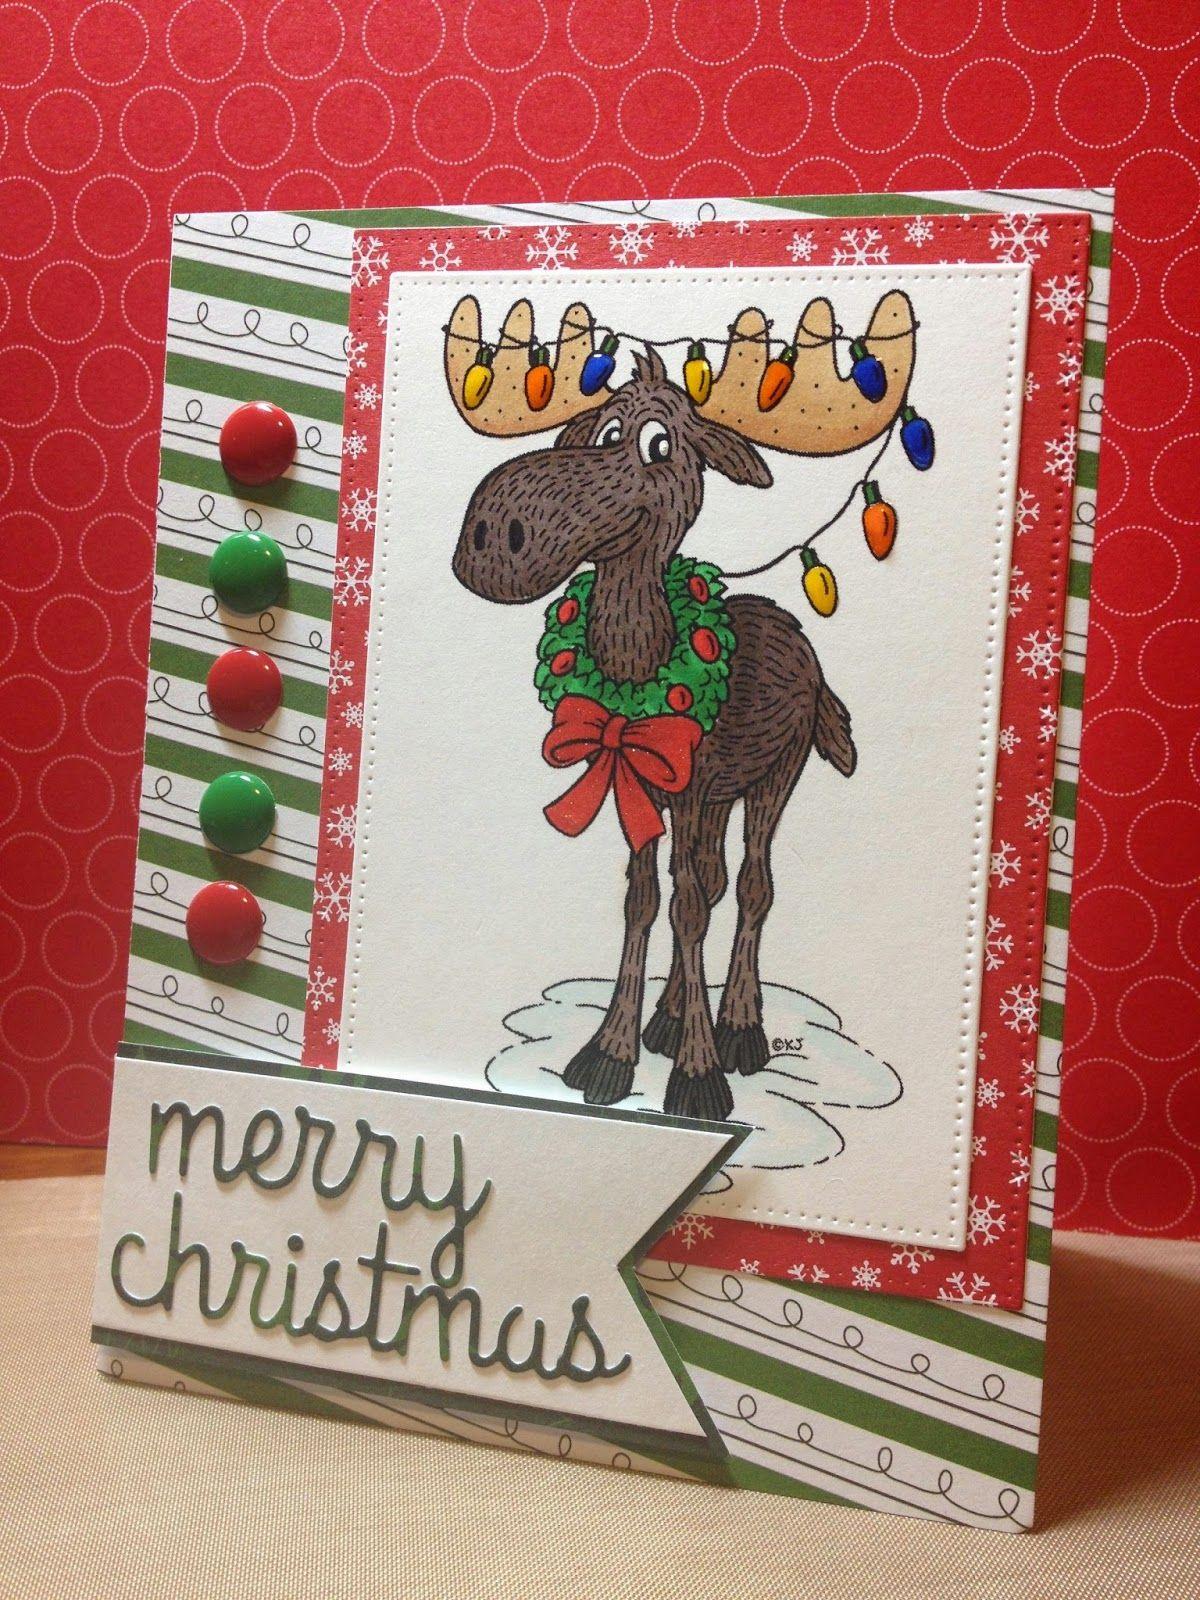 Christmas Moose karensdoodles.com | Cards Made by Me | Pinterest ...